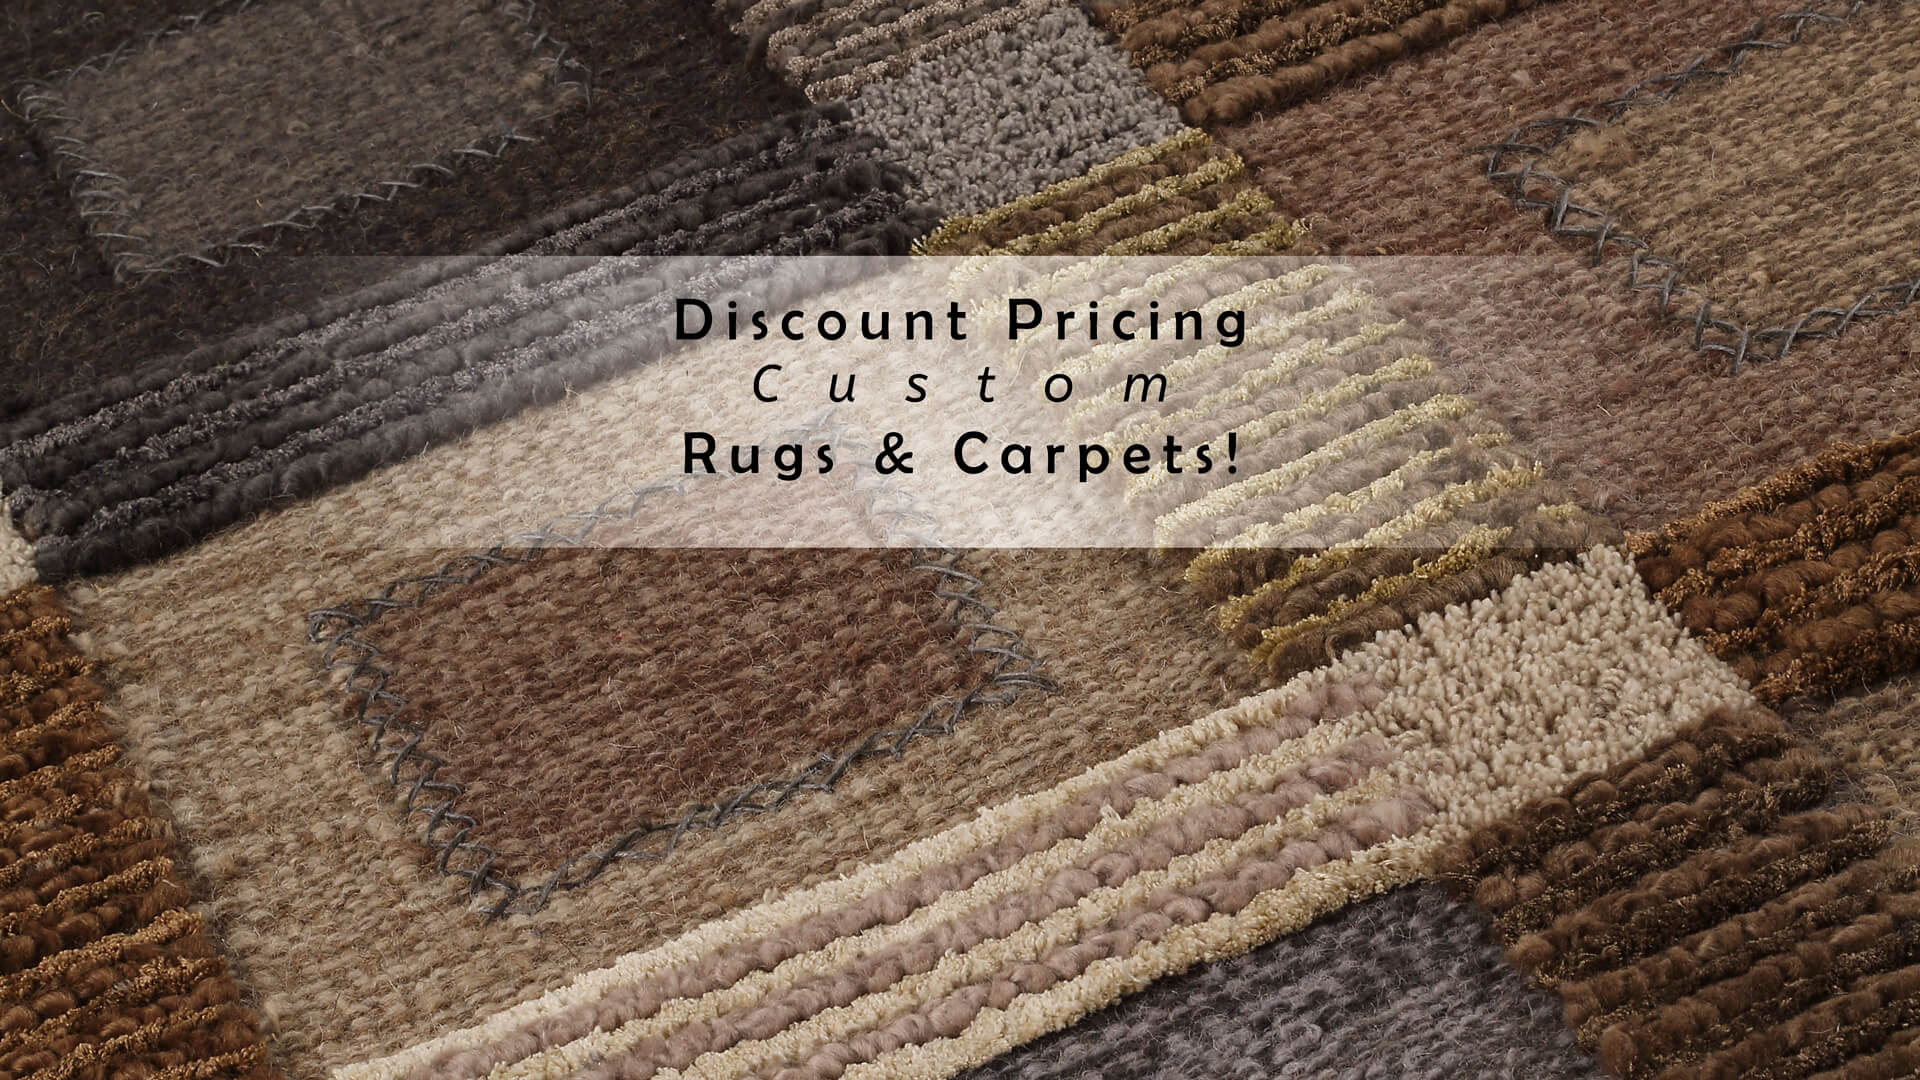 discount-pricing-custom-rugs